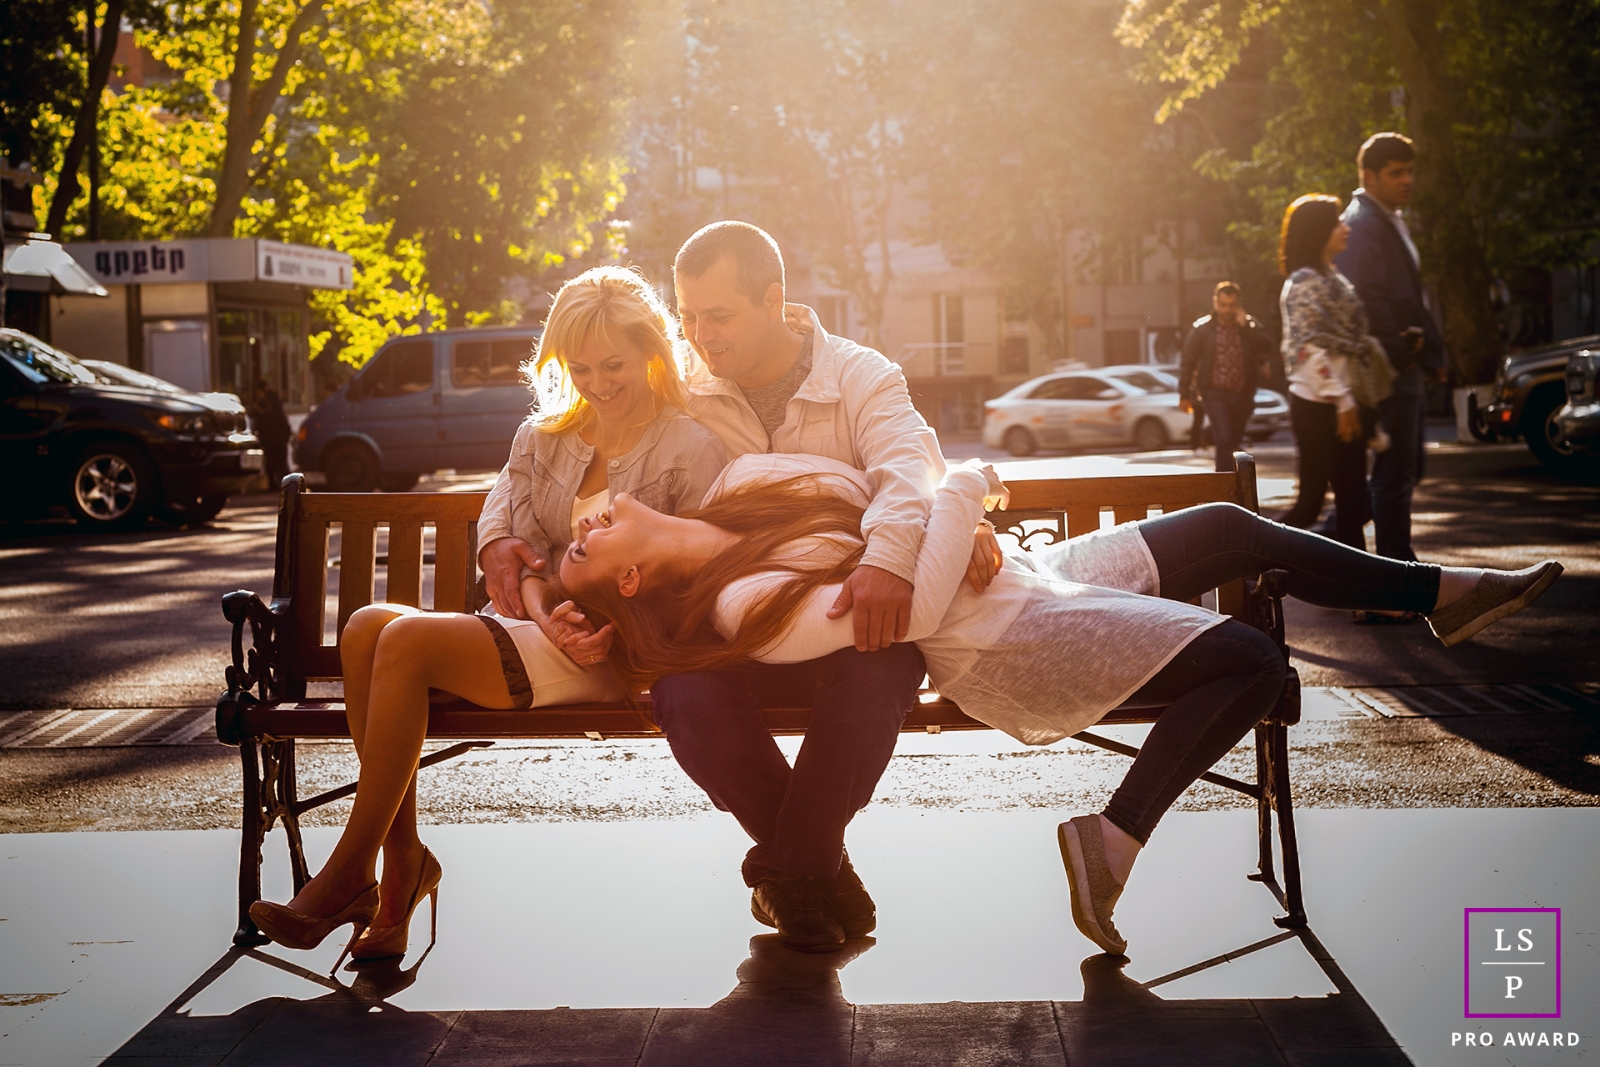 Albert Buniatyan is a lifestyle photographer from Yerevan